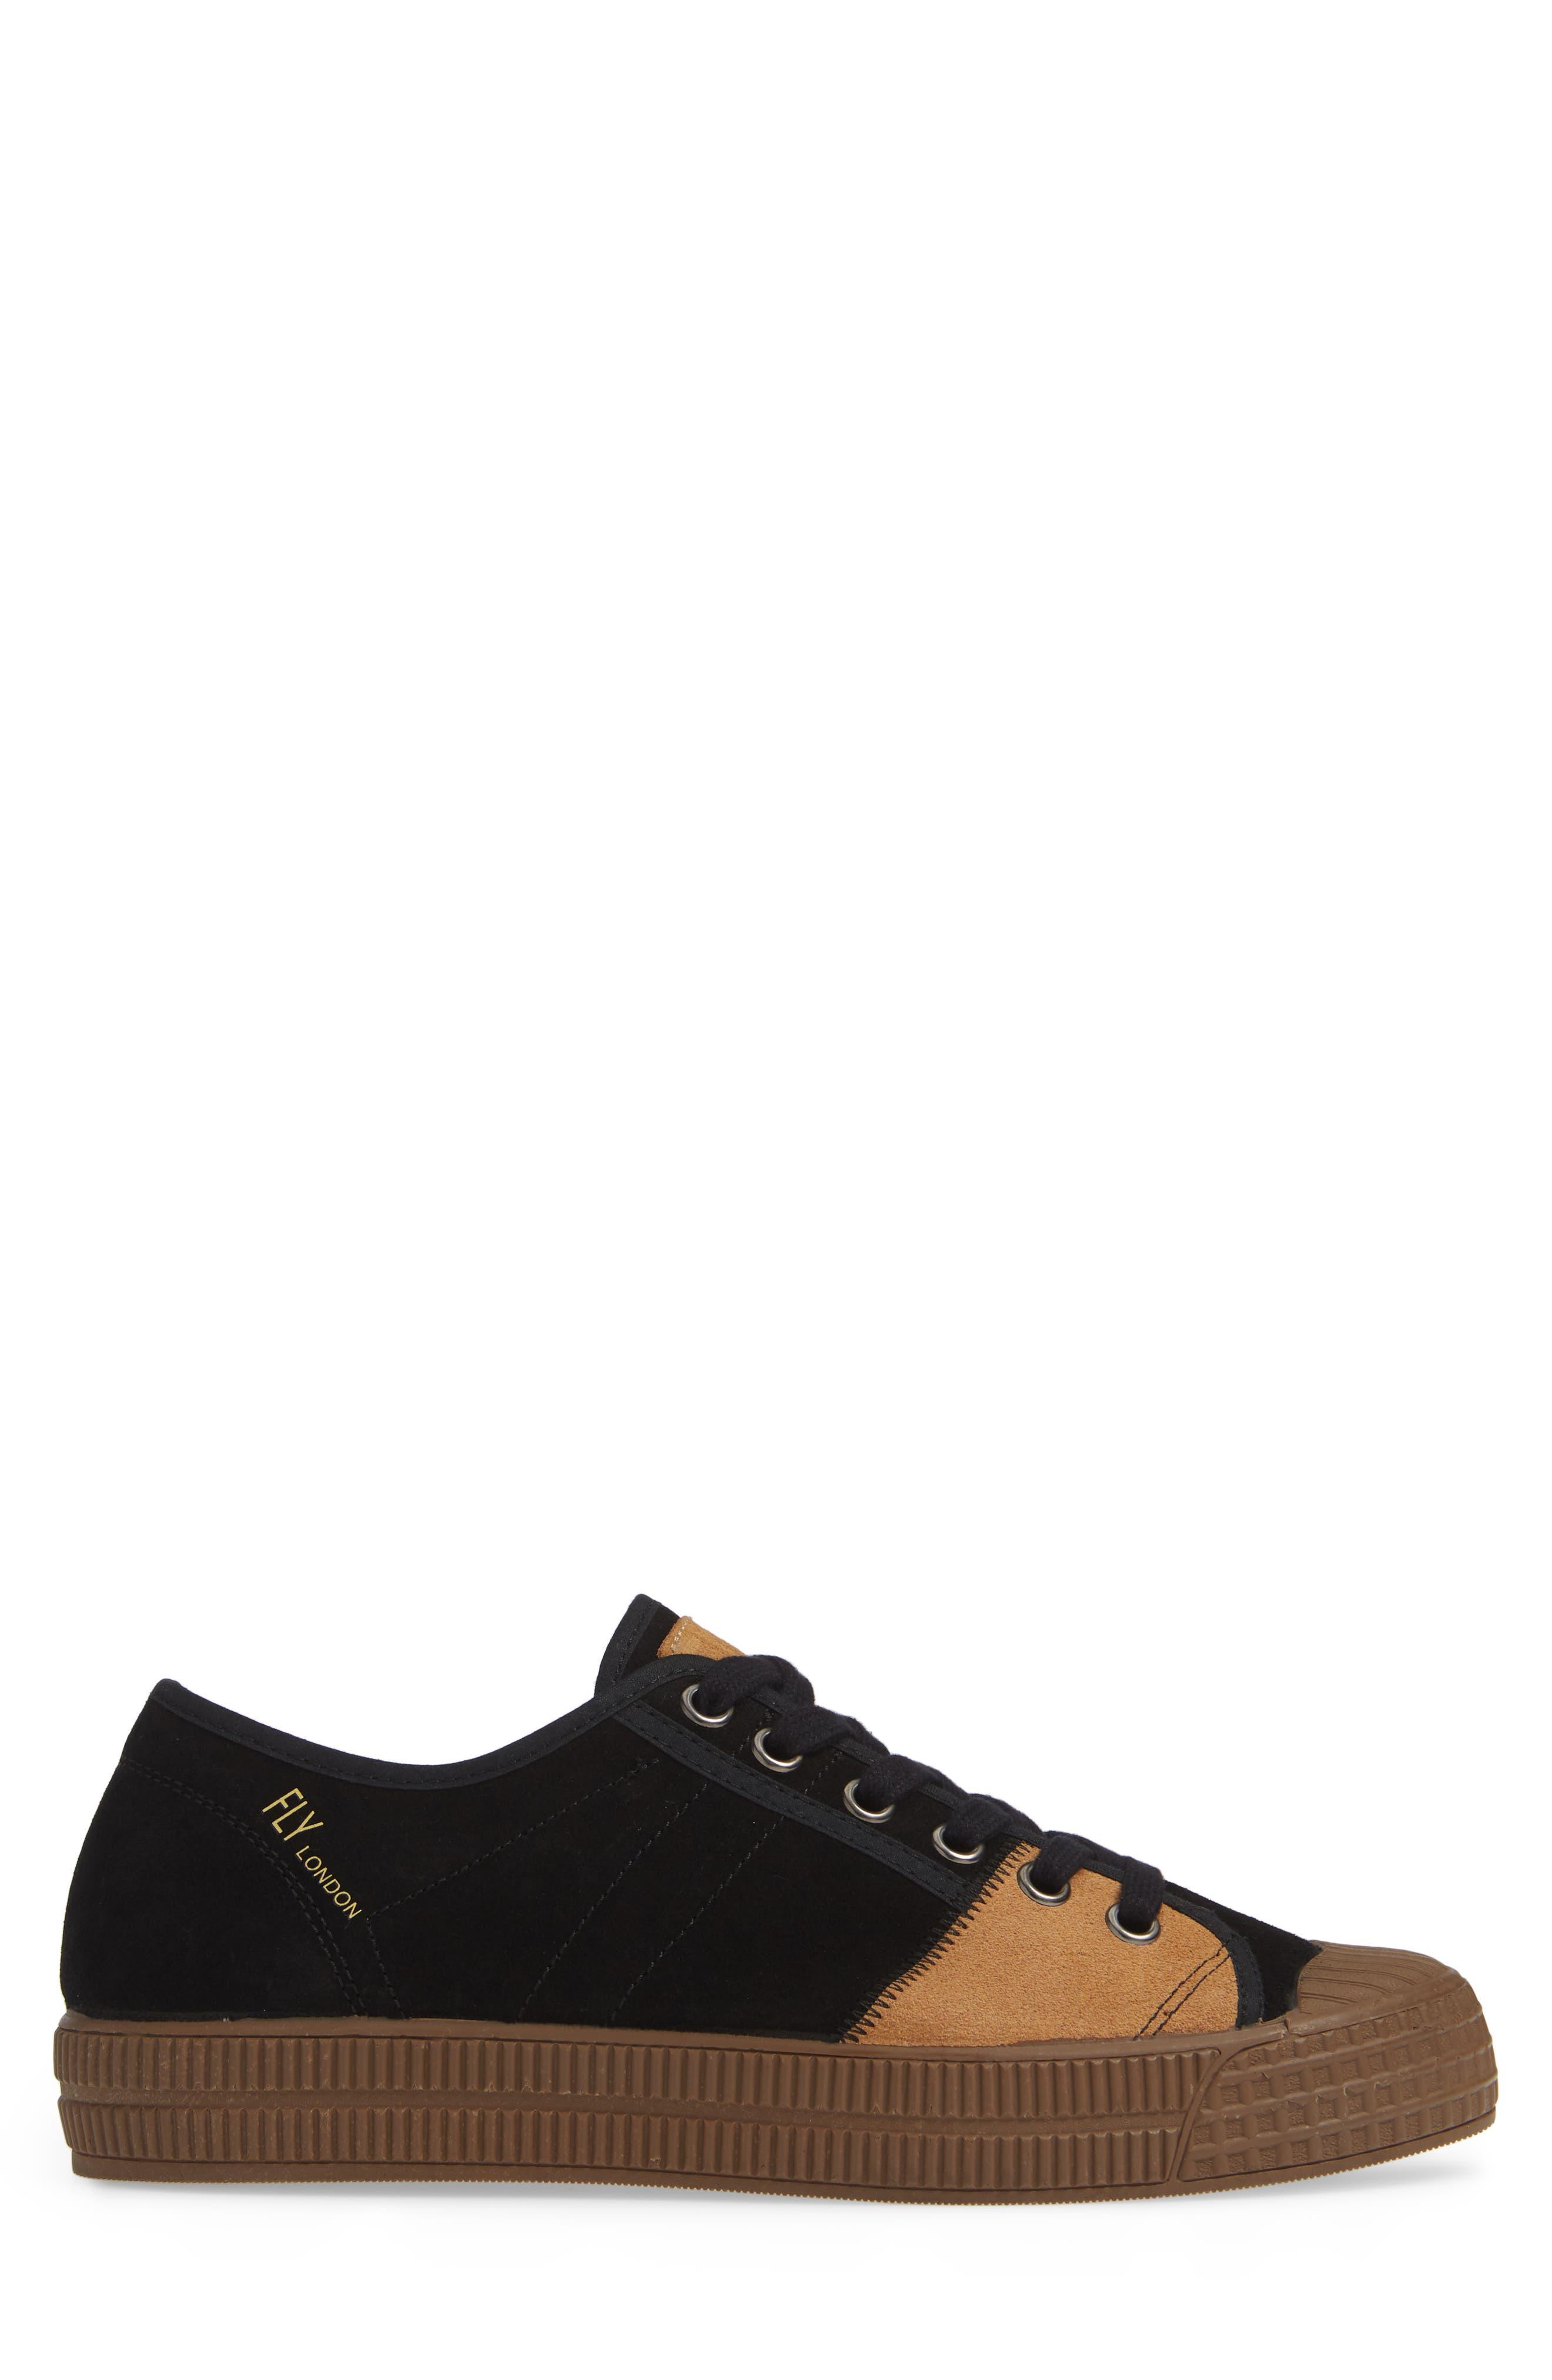 Foto Sneaker,                             Alternate thumbnail 3, color,                             BLACK/ CAMEL SUEDE